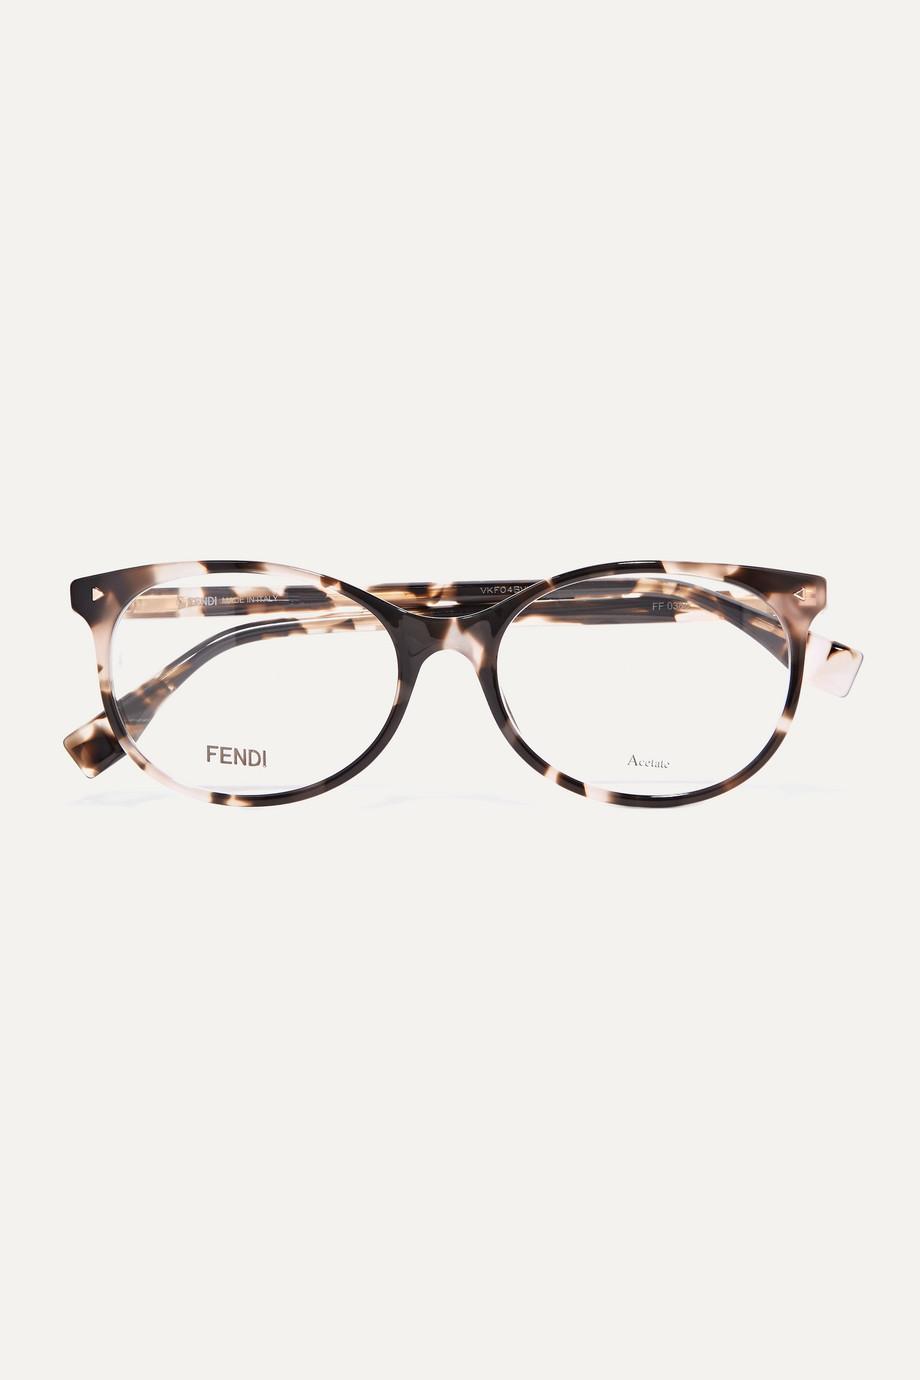 Fendi Round-frame tortoiseshell acetate optical glasses